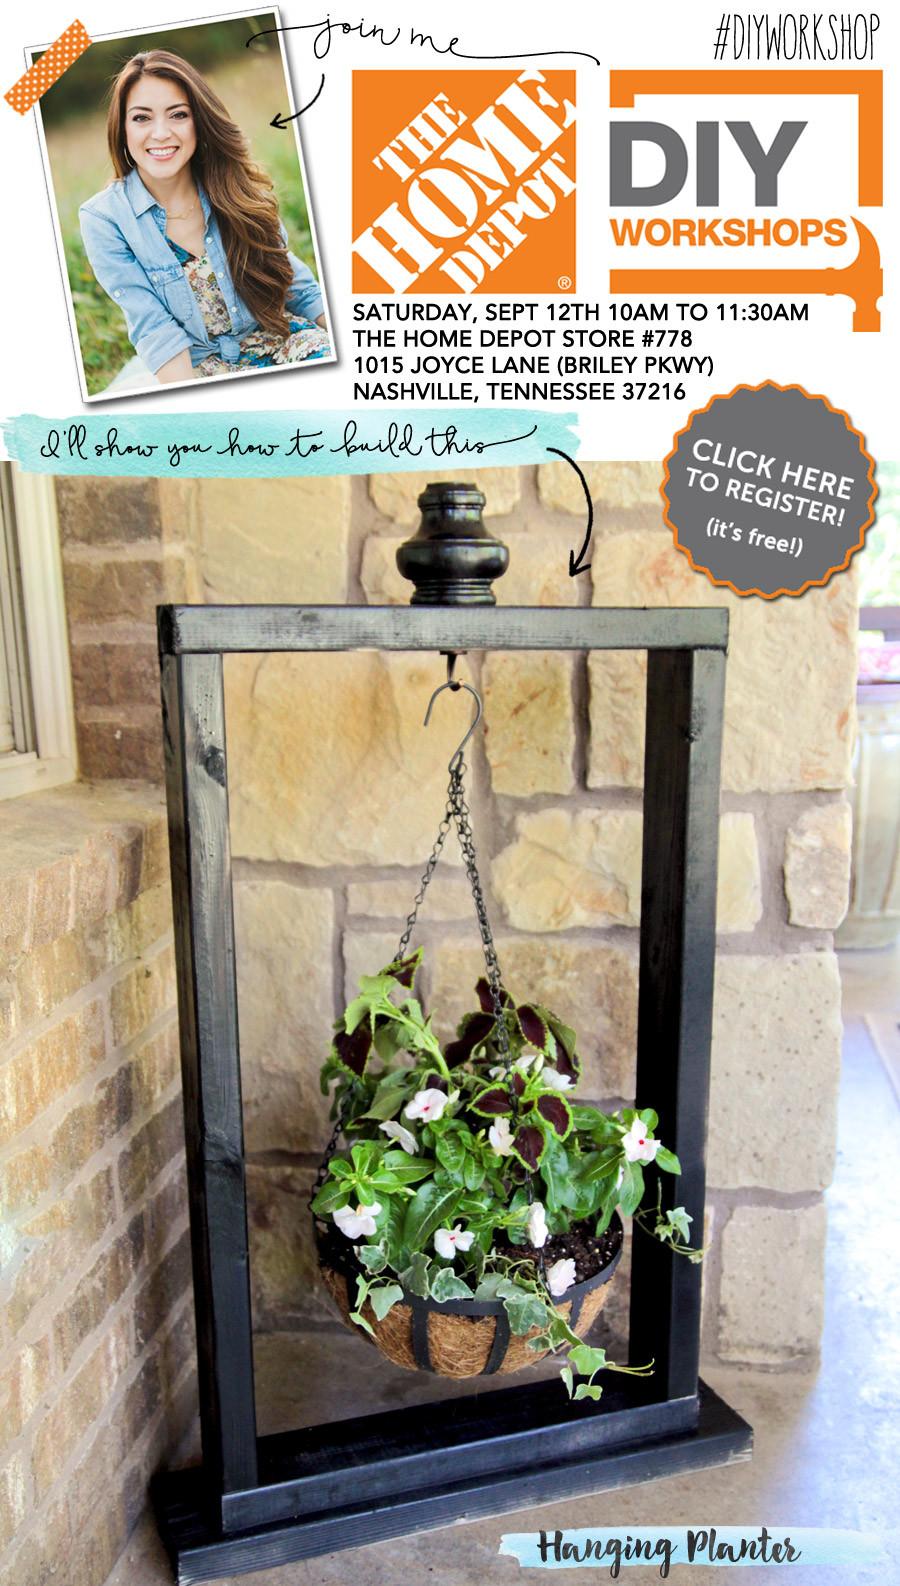 Best ideas about Home Depot DIY Workshop . Save or Pin Home Depot DIY Workshop Hanging Planter Now.